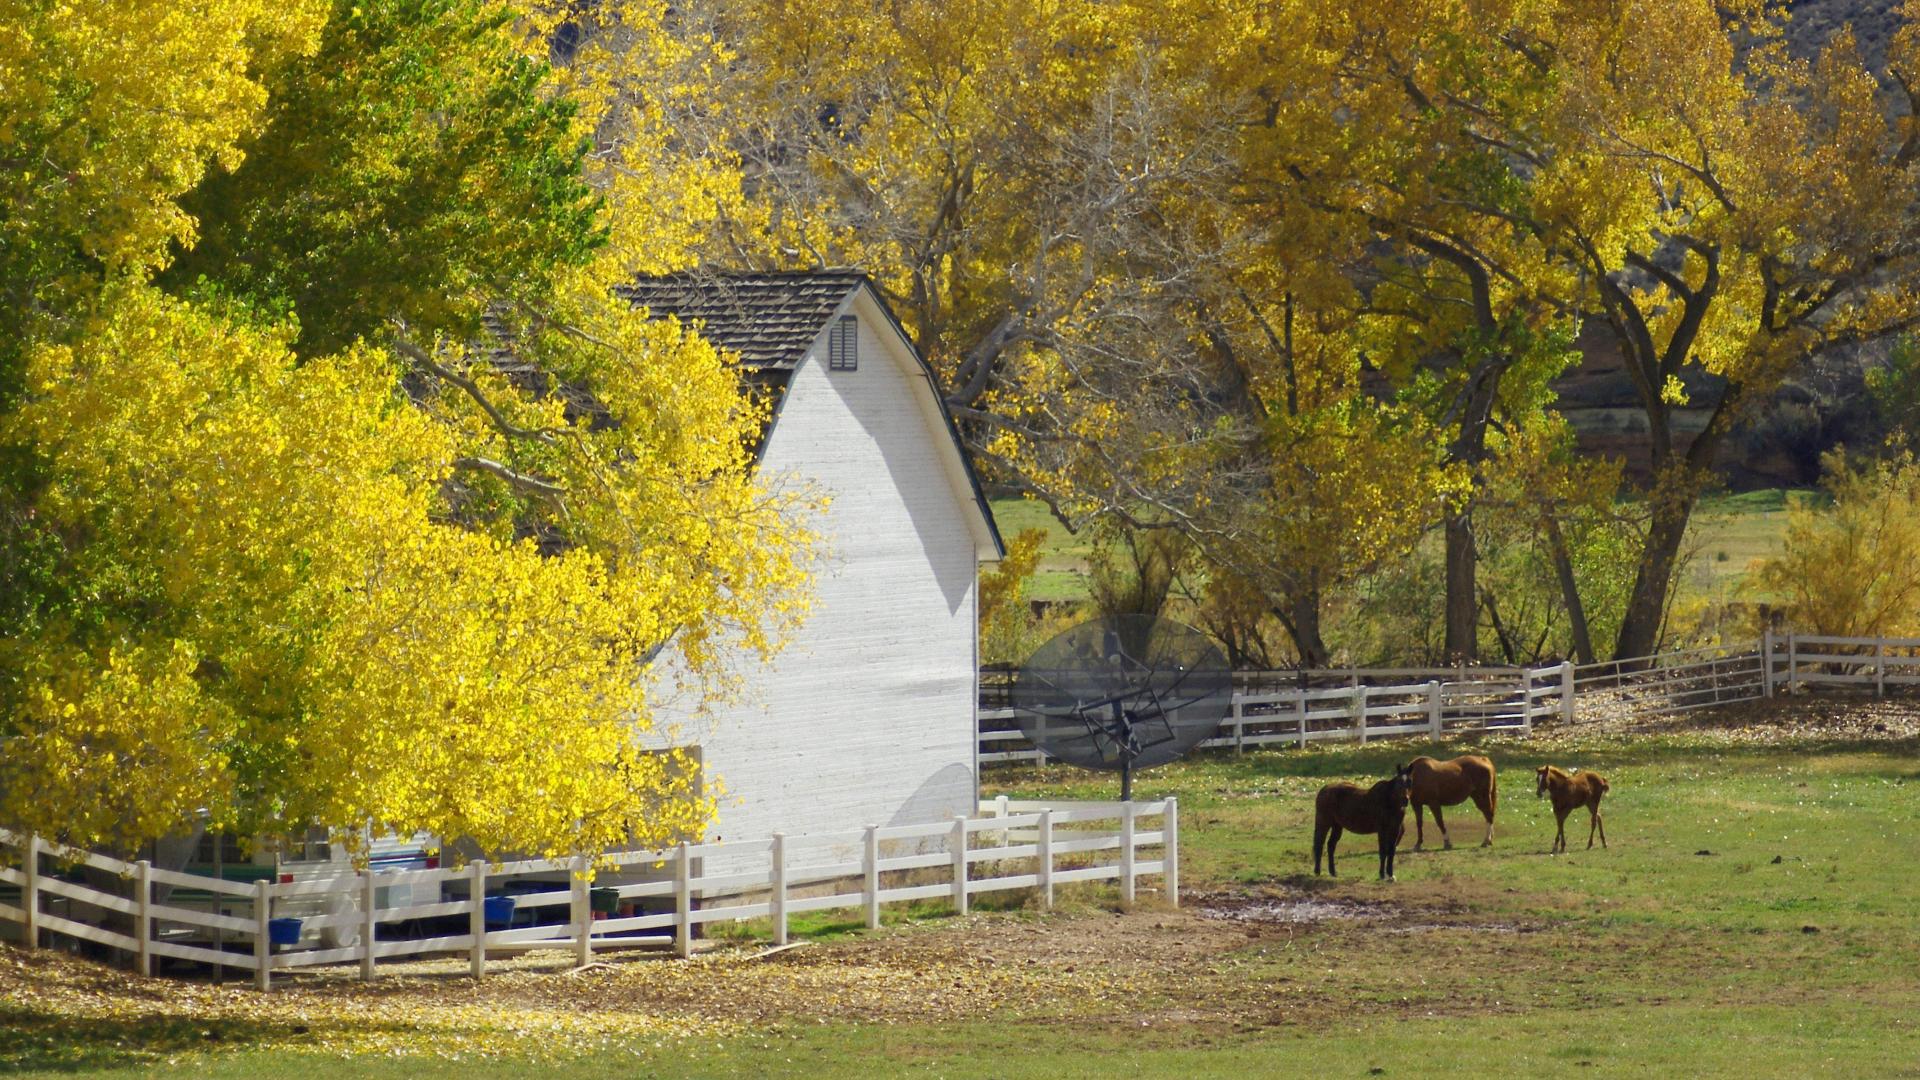 Autumn country farm wallpaper   ForWallpapercom 1920x1080